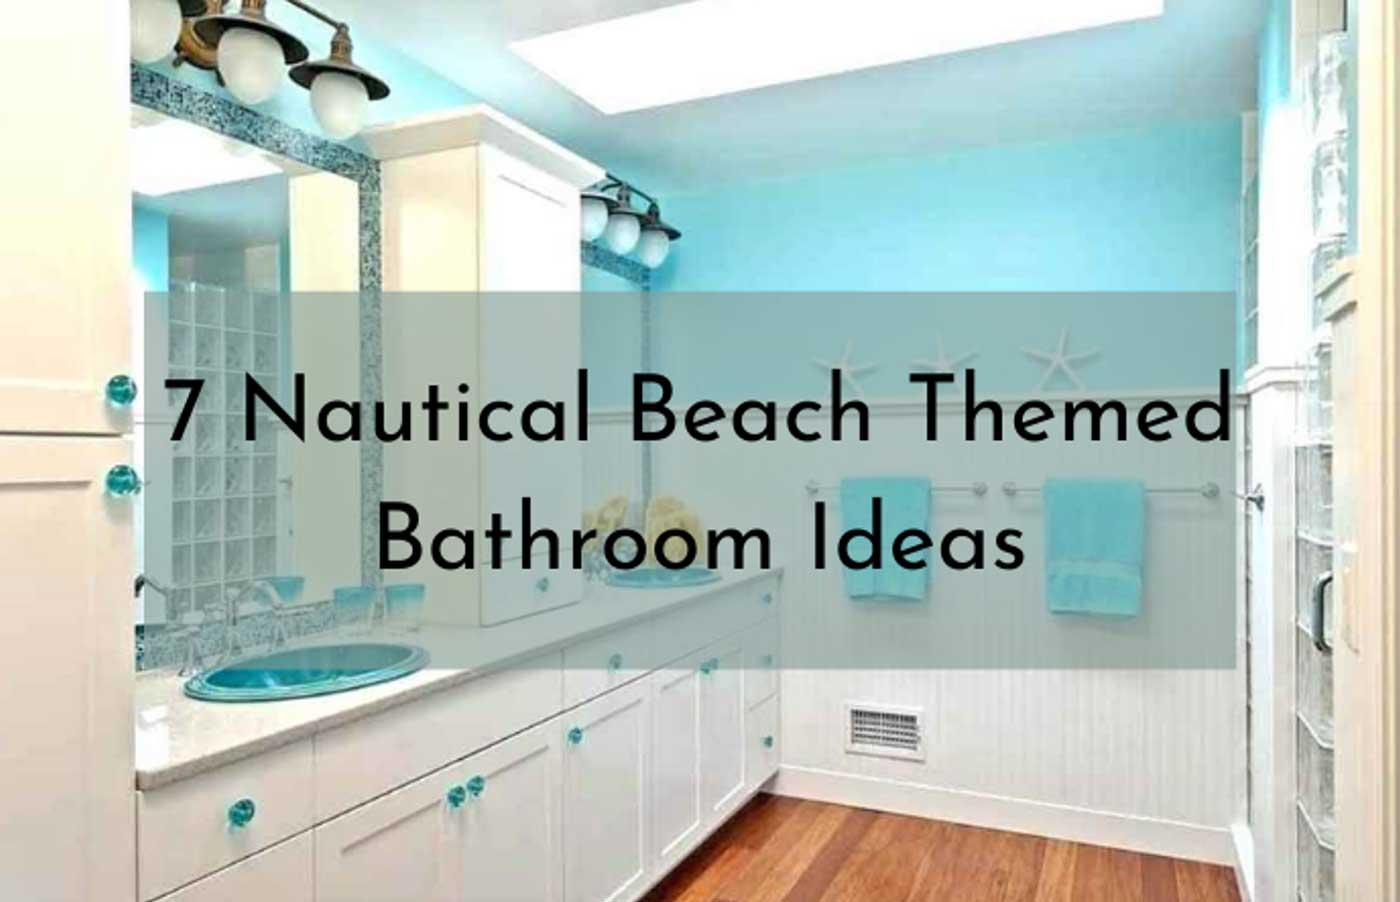 7 Nautical Beach Themed Bathroom Ideas To Blow You Away